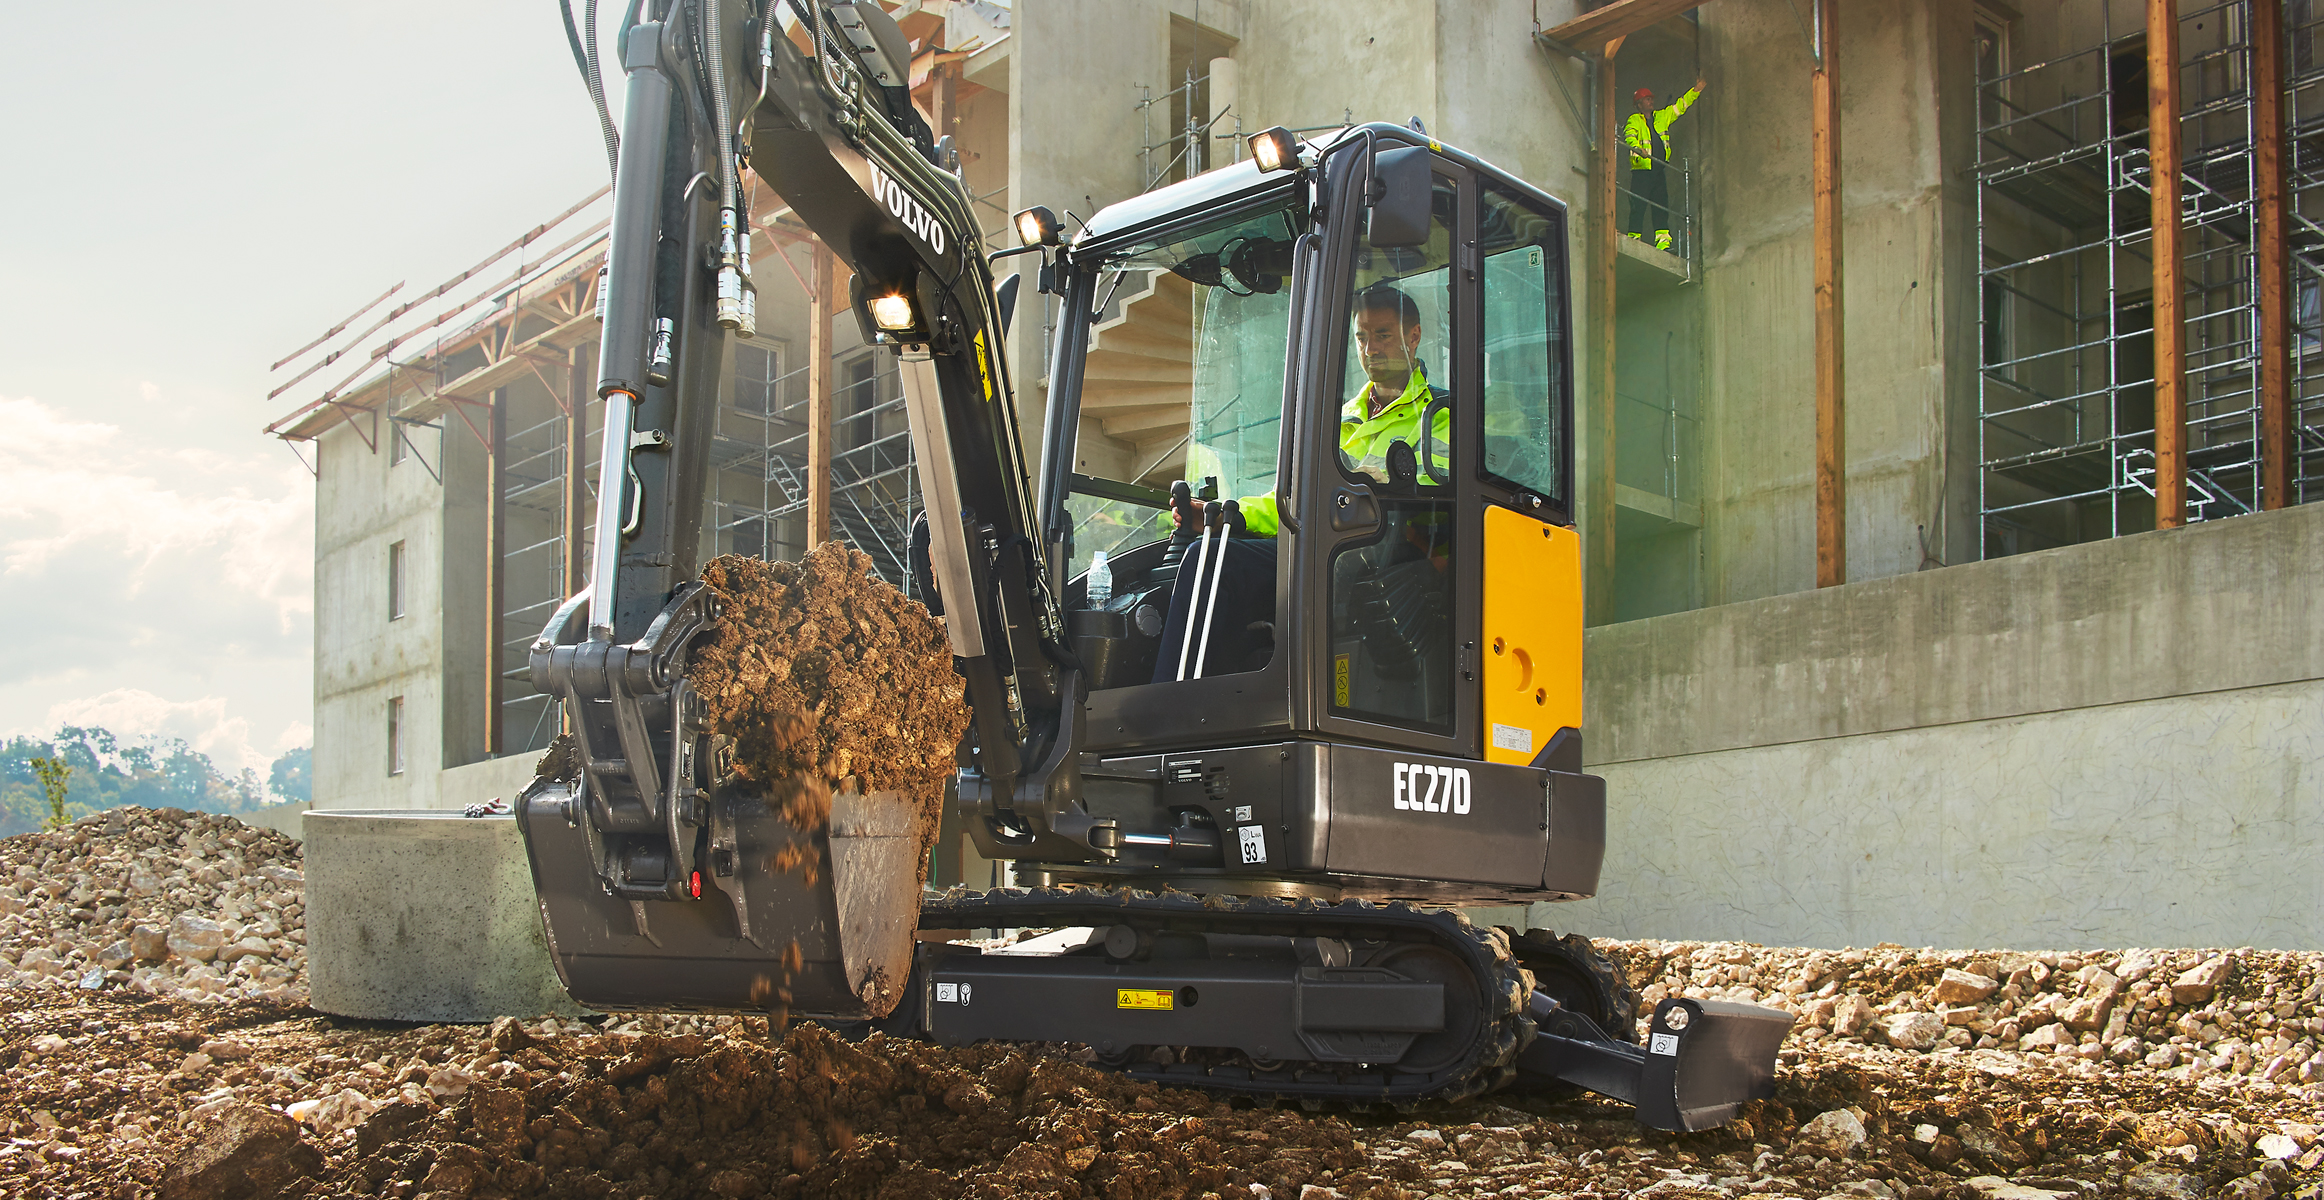 ec27d compact excavators media gallery volvo construction